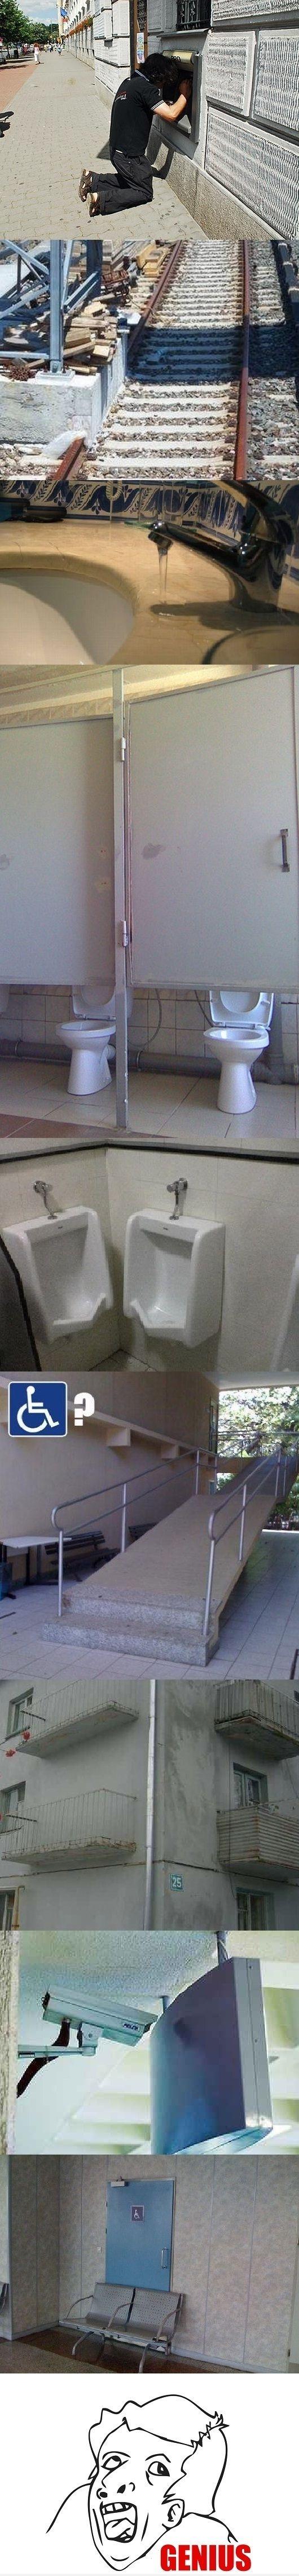 Genius contractors...you had one job!!